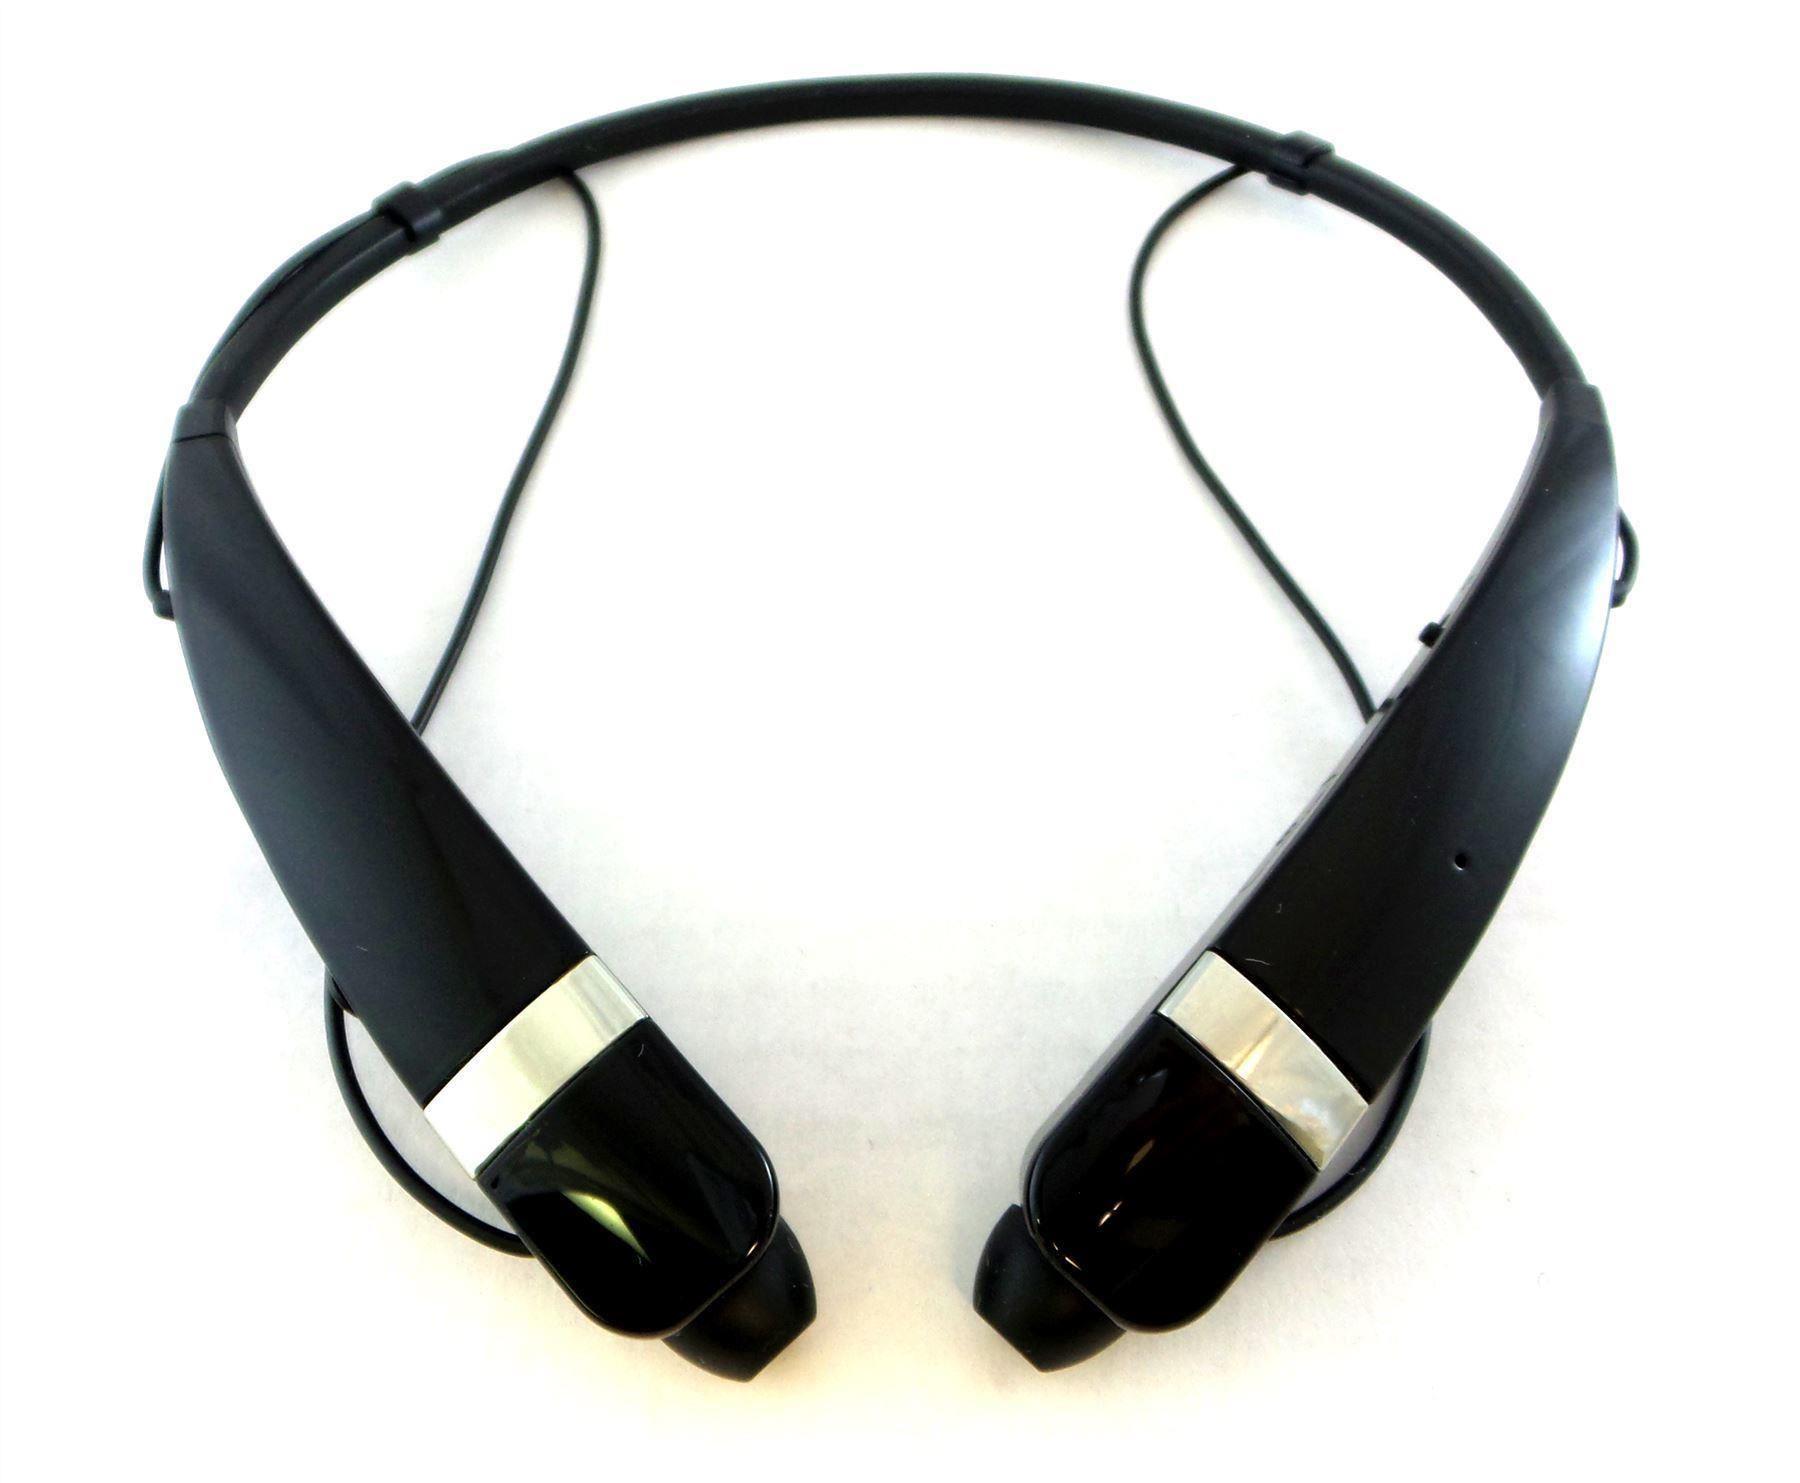 LG Tone Pro HBS 760 Headphones Wireless Bluetooth Stereo